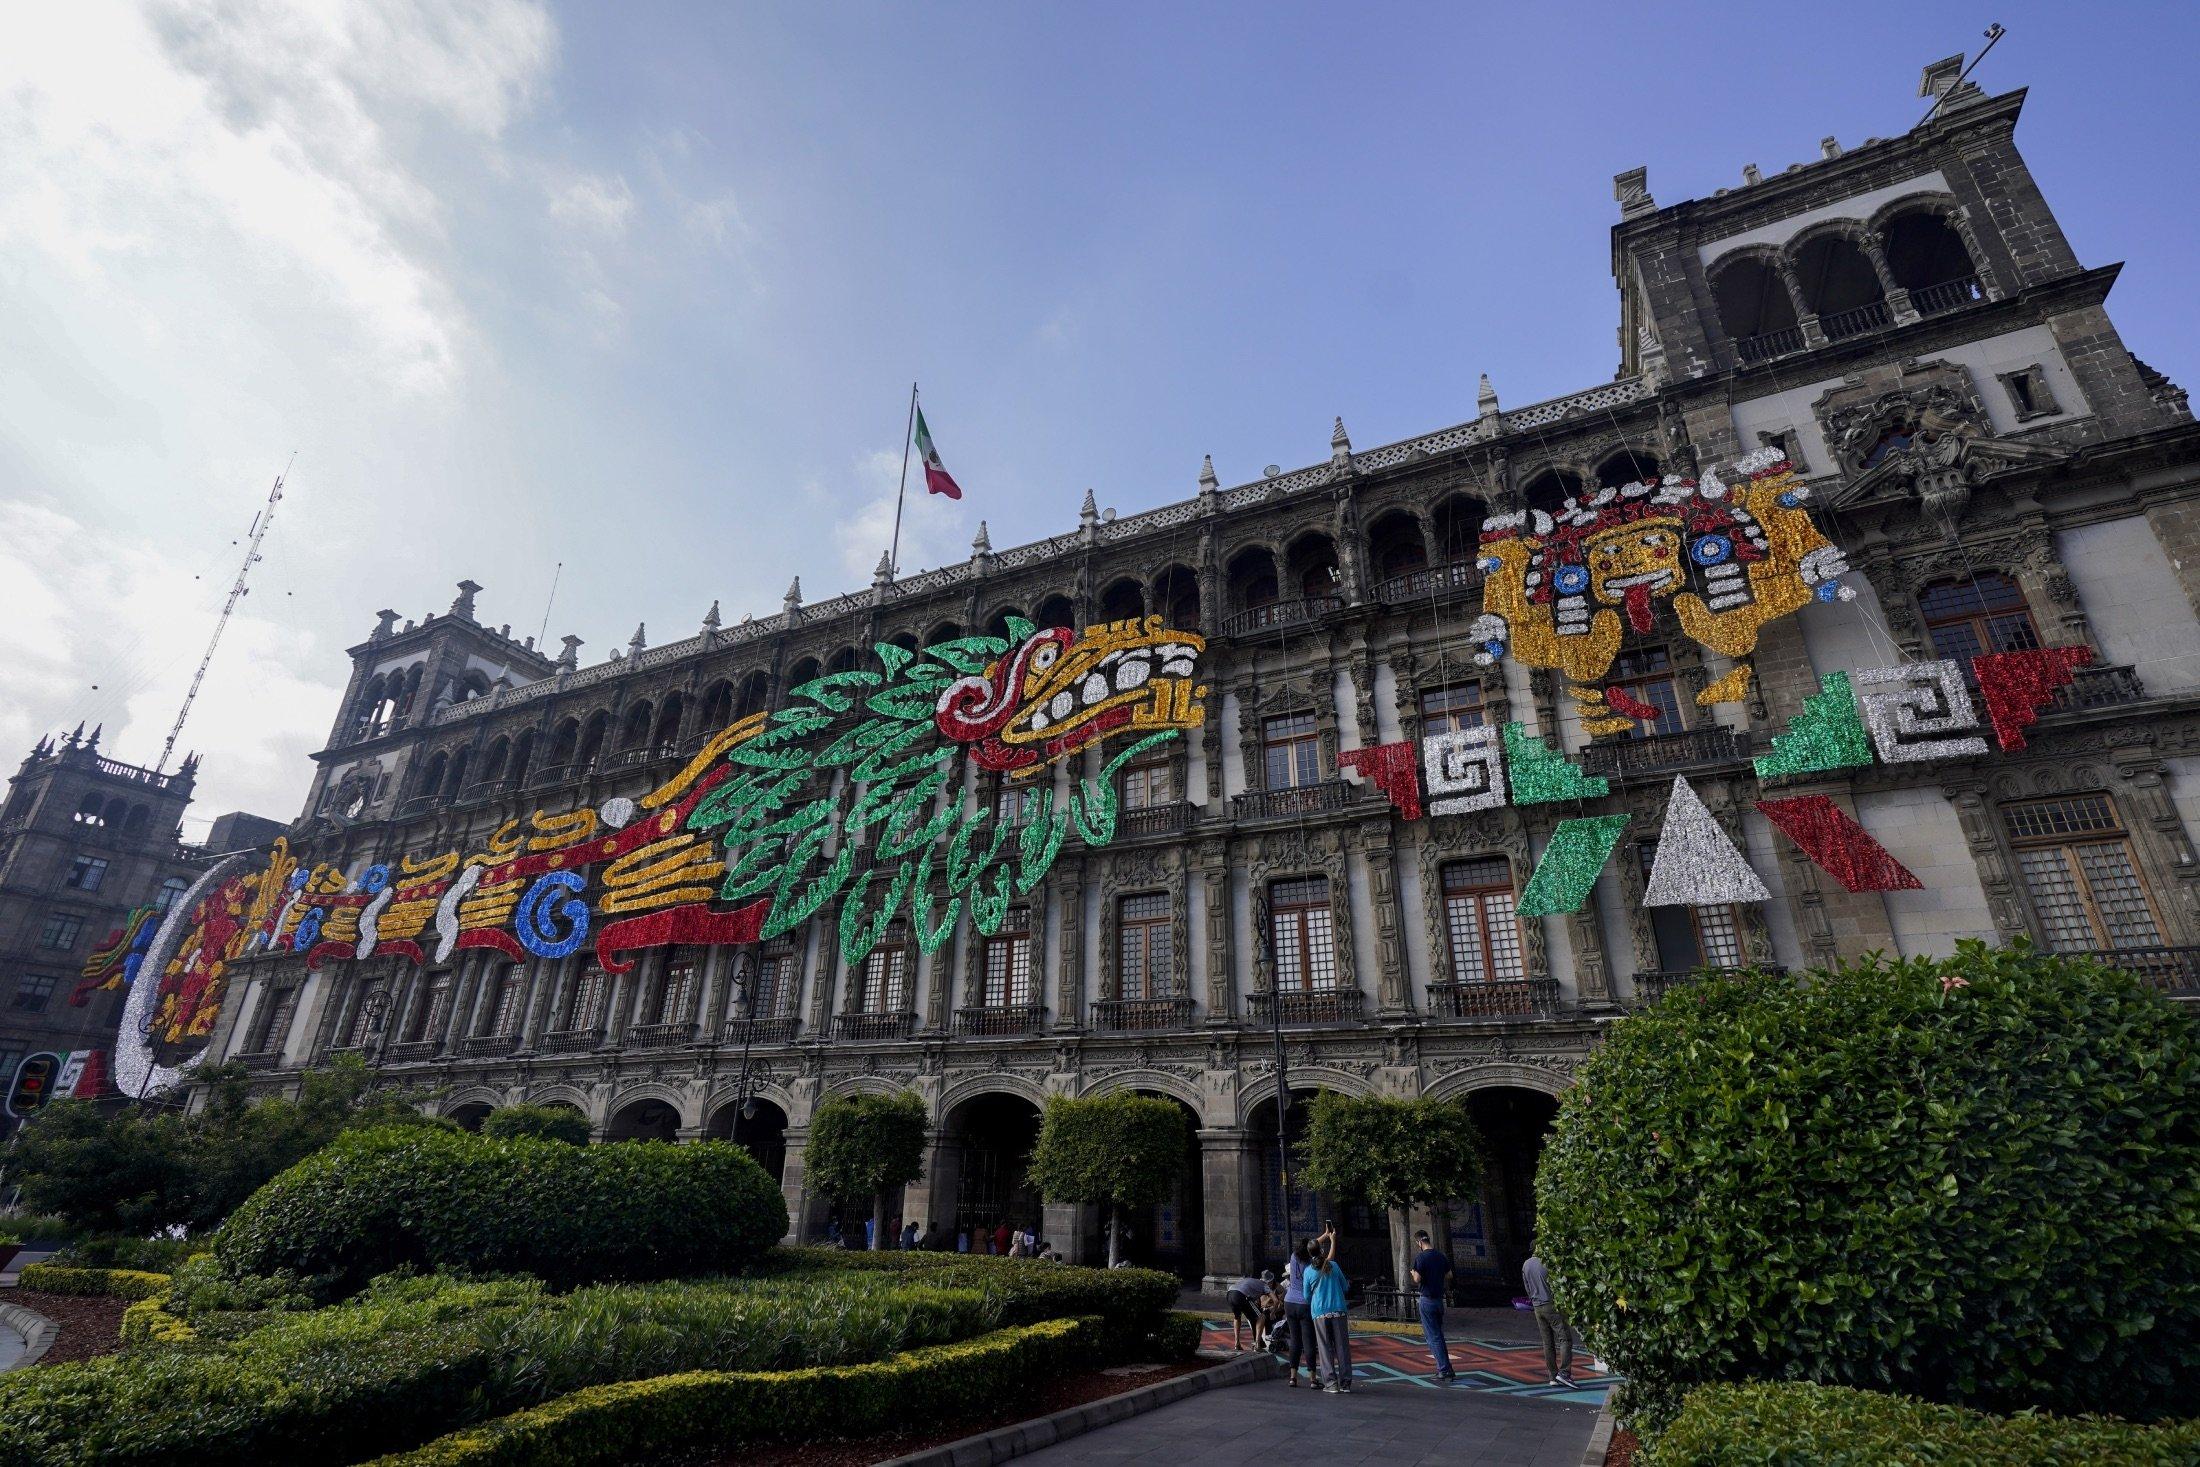 An image of the Pre-Columbian god Quetzalcoatl adorns a building at Mexico City´s main square the Zocalo, Mexico, Aug. 9, 2021. (AP Photo)